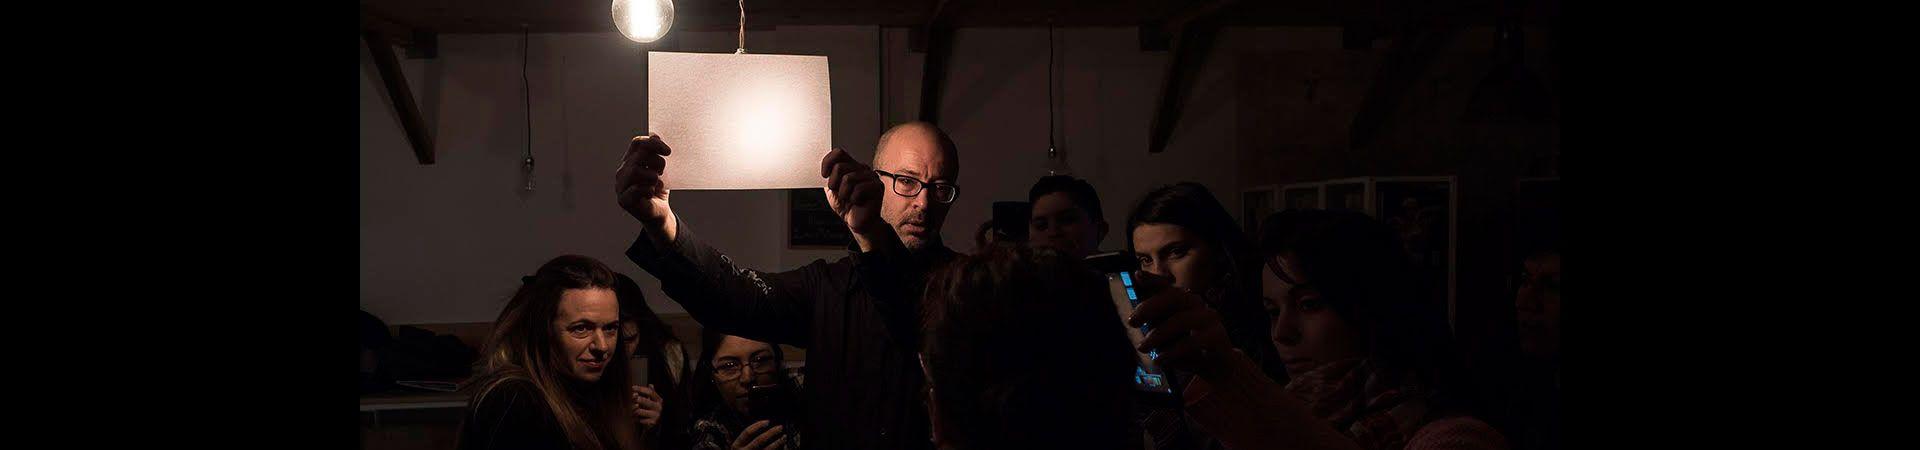 Workshop The world through the eye of a (Smartphone) camera amb Fernando Prats